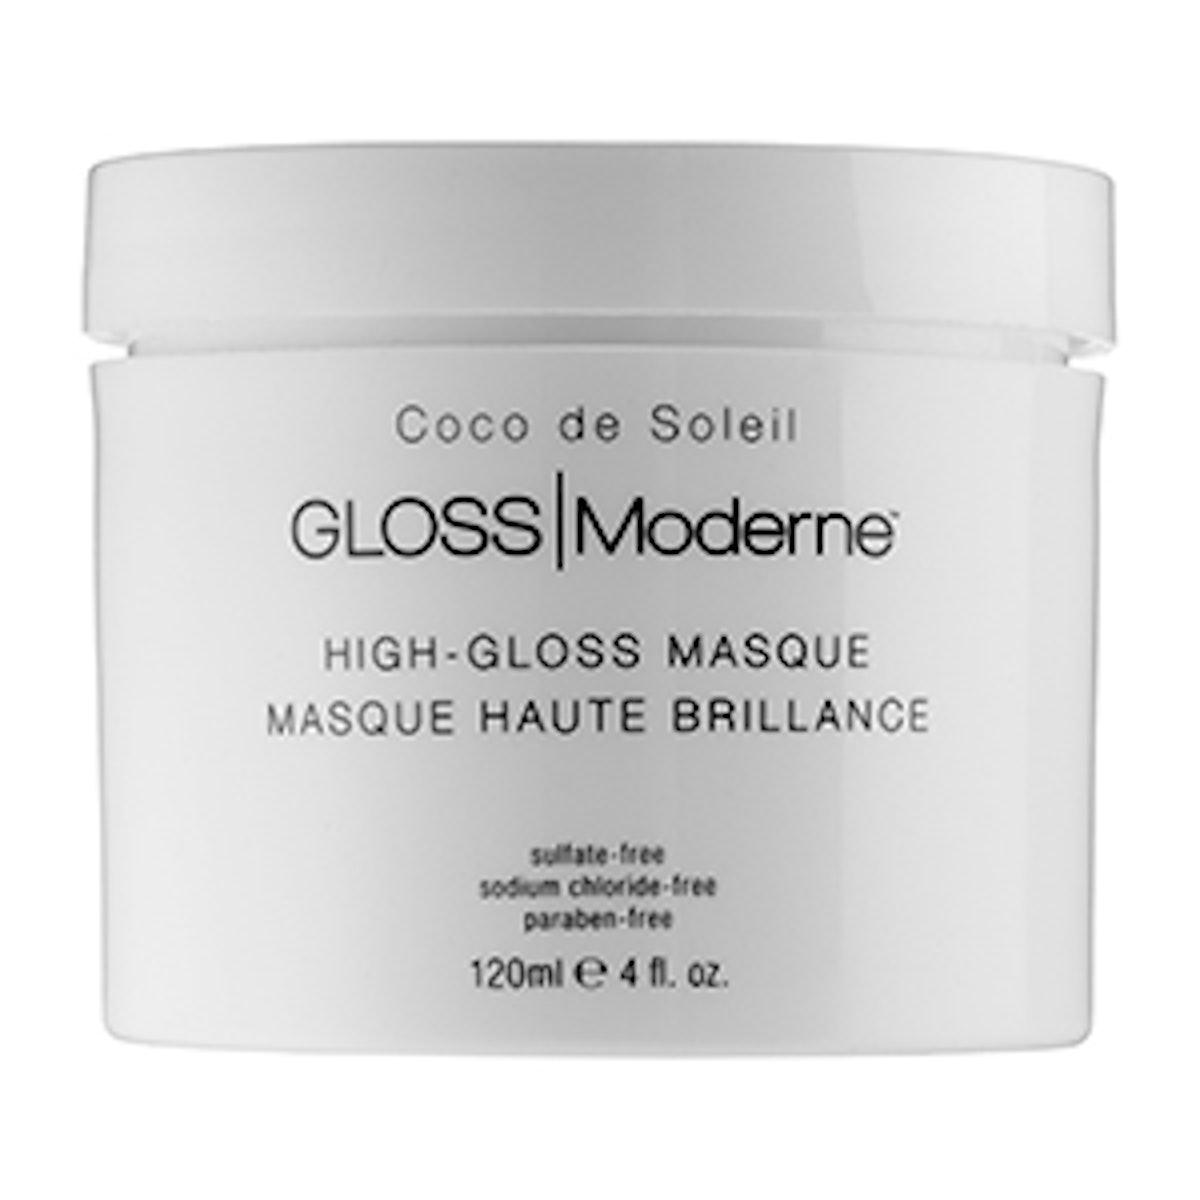 High-Gloss Masque